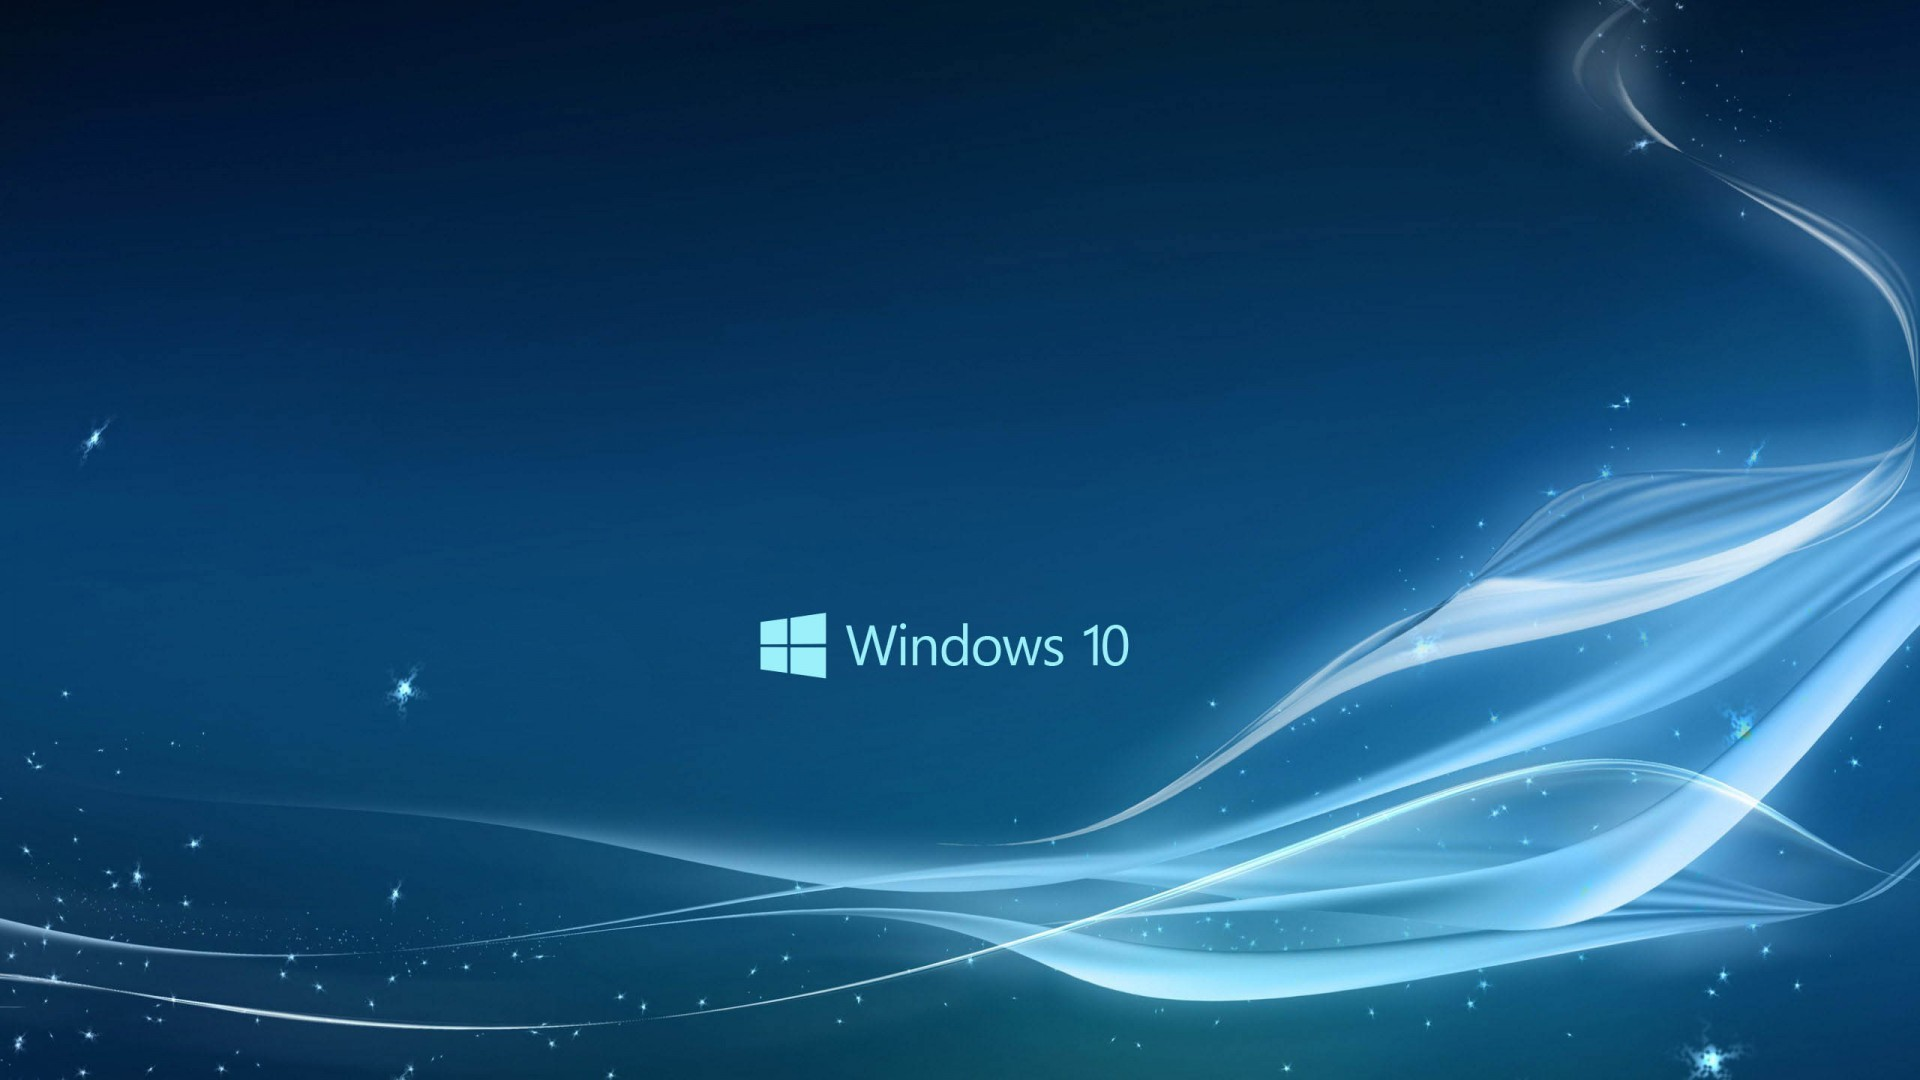 1920x1080 Windows 10 HD wallpaper 2015 1920x1080 (1080p) - Wallpaper - Wallpaper .